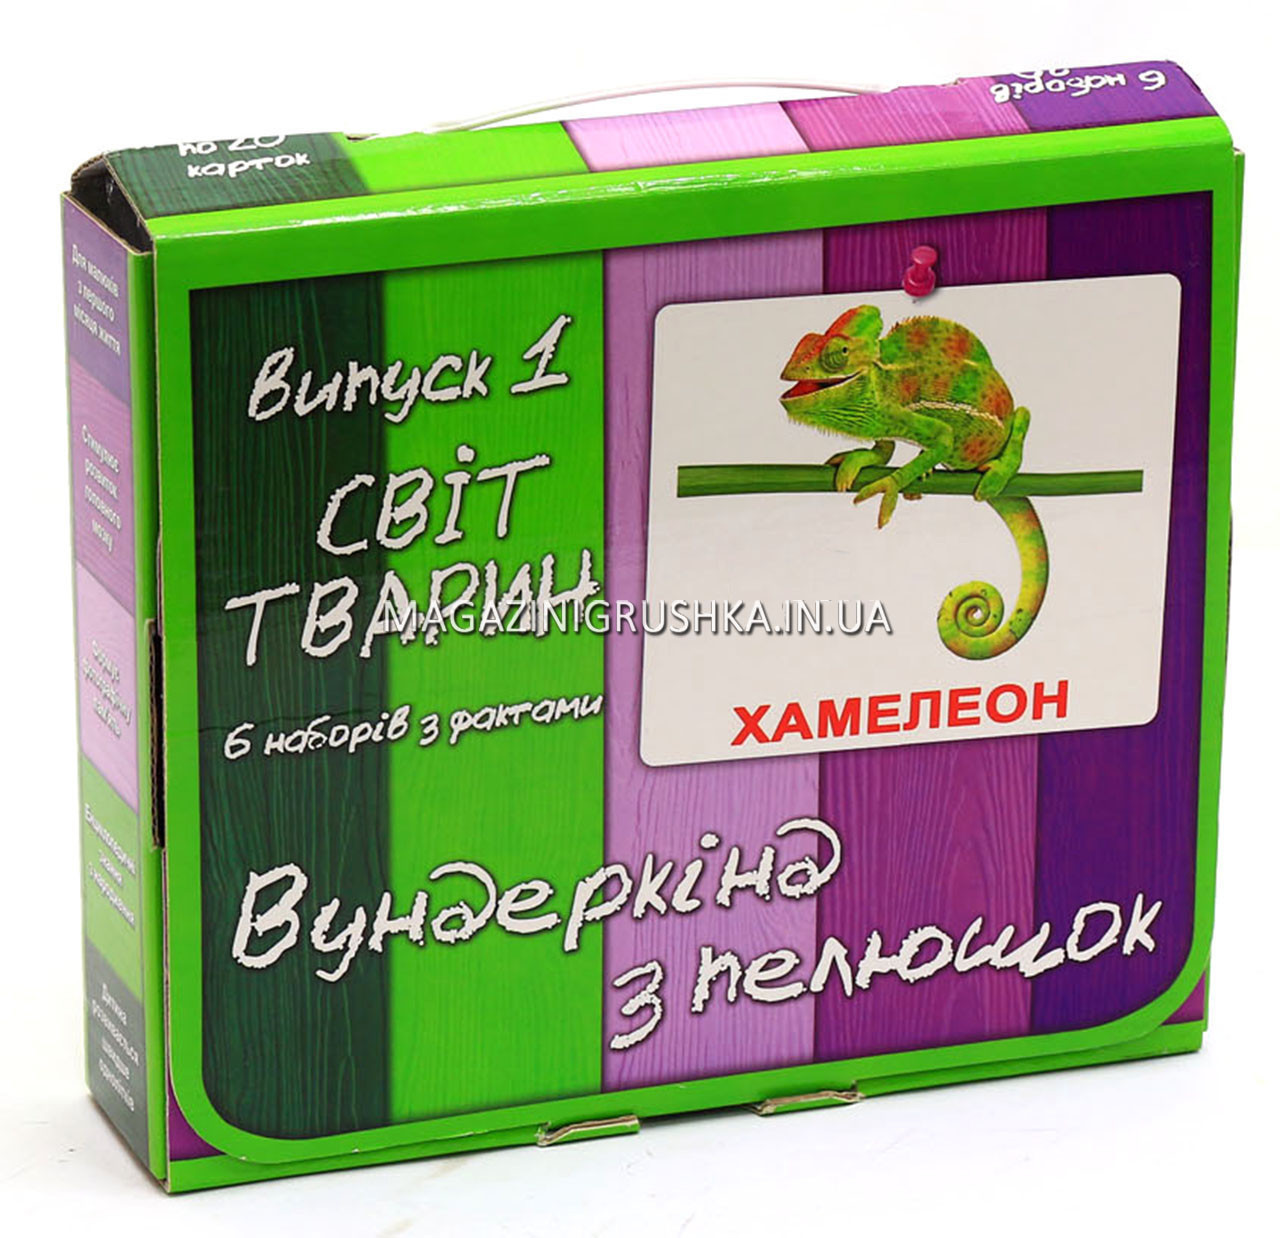 Развивающая игра Карточки Домана Випуск 1 Світ тварин «Вундеркинд с пеленок» - 6 наборов арт.096495